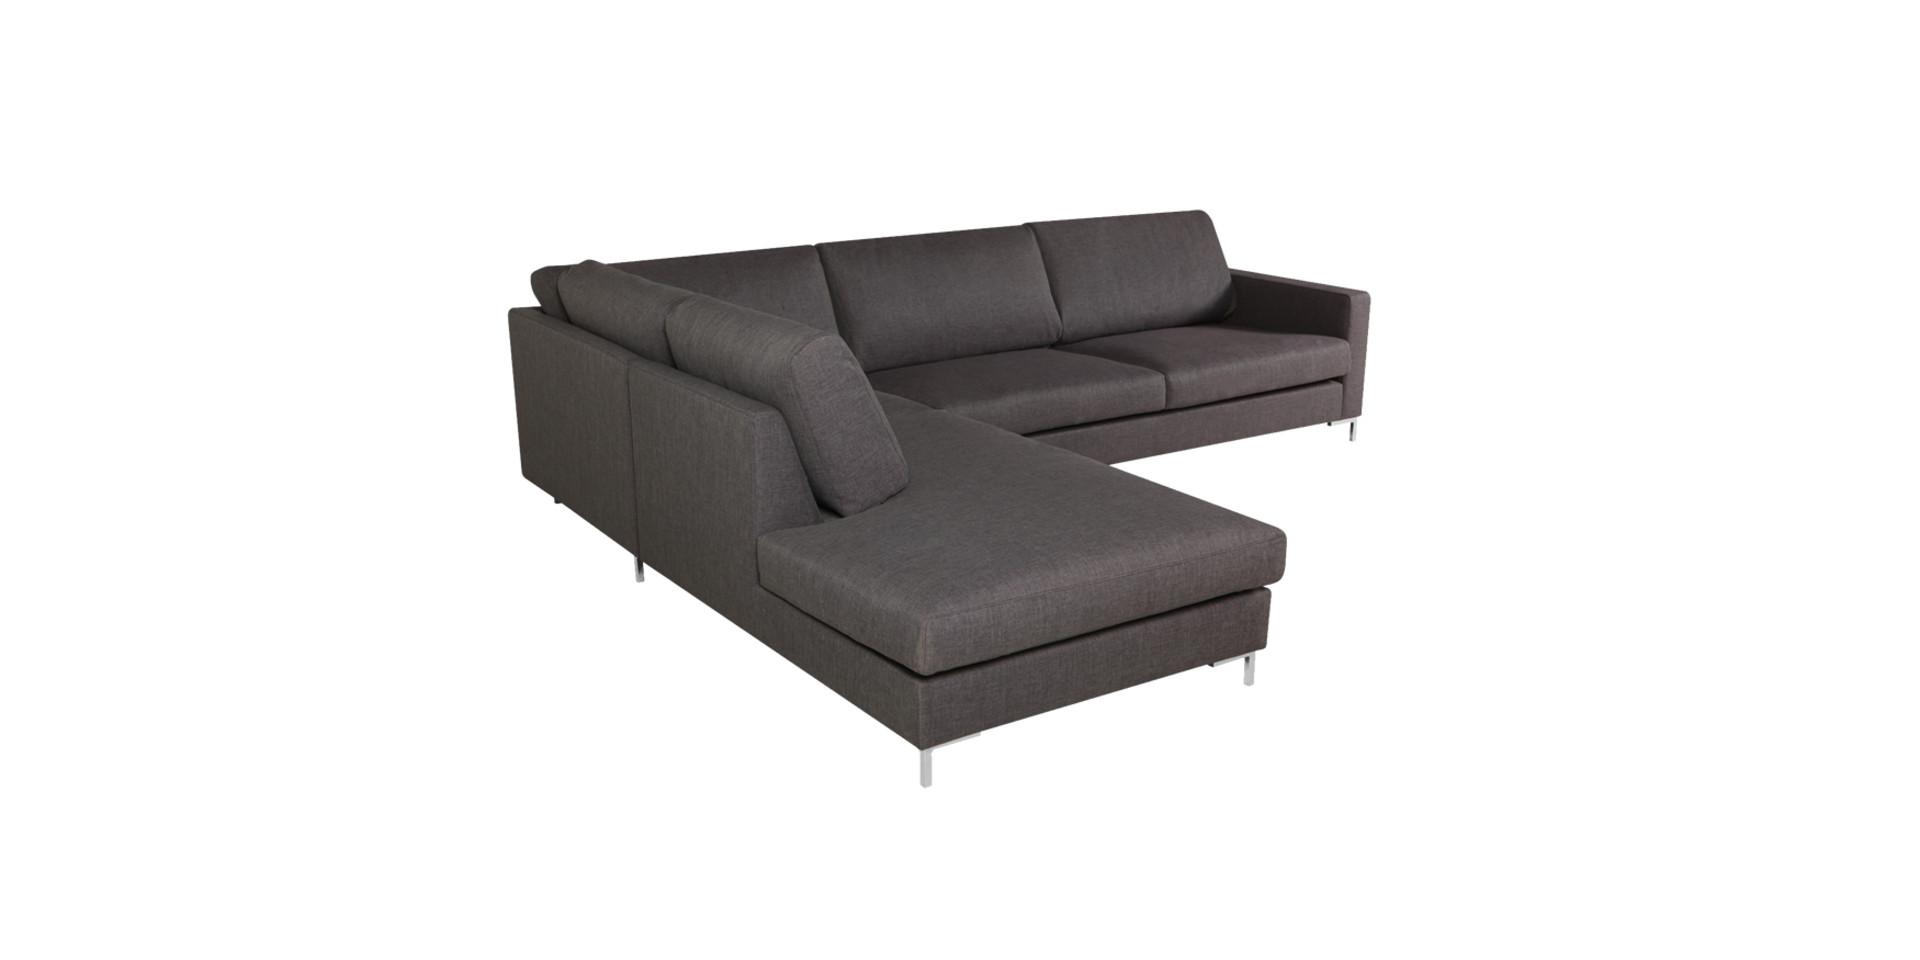 sits-quattro-angle-set14_das67_lila_3_0